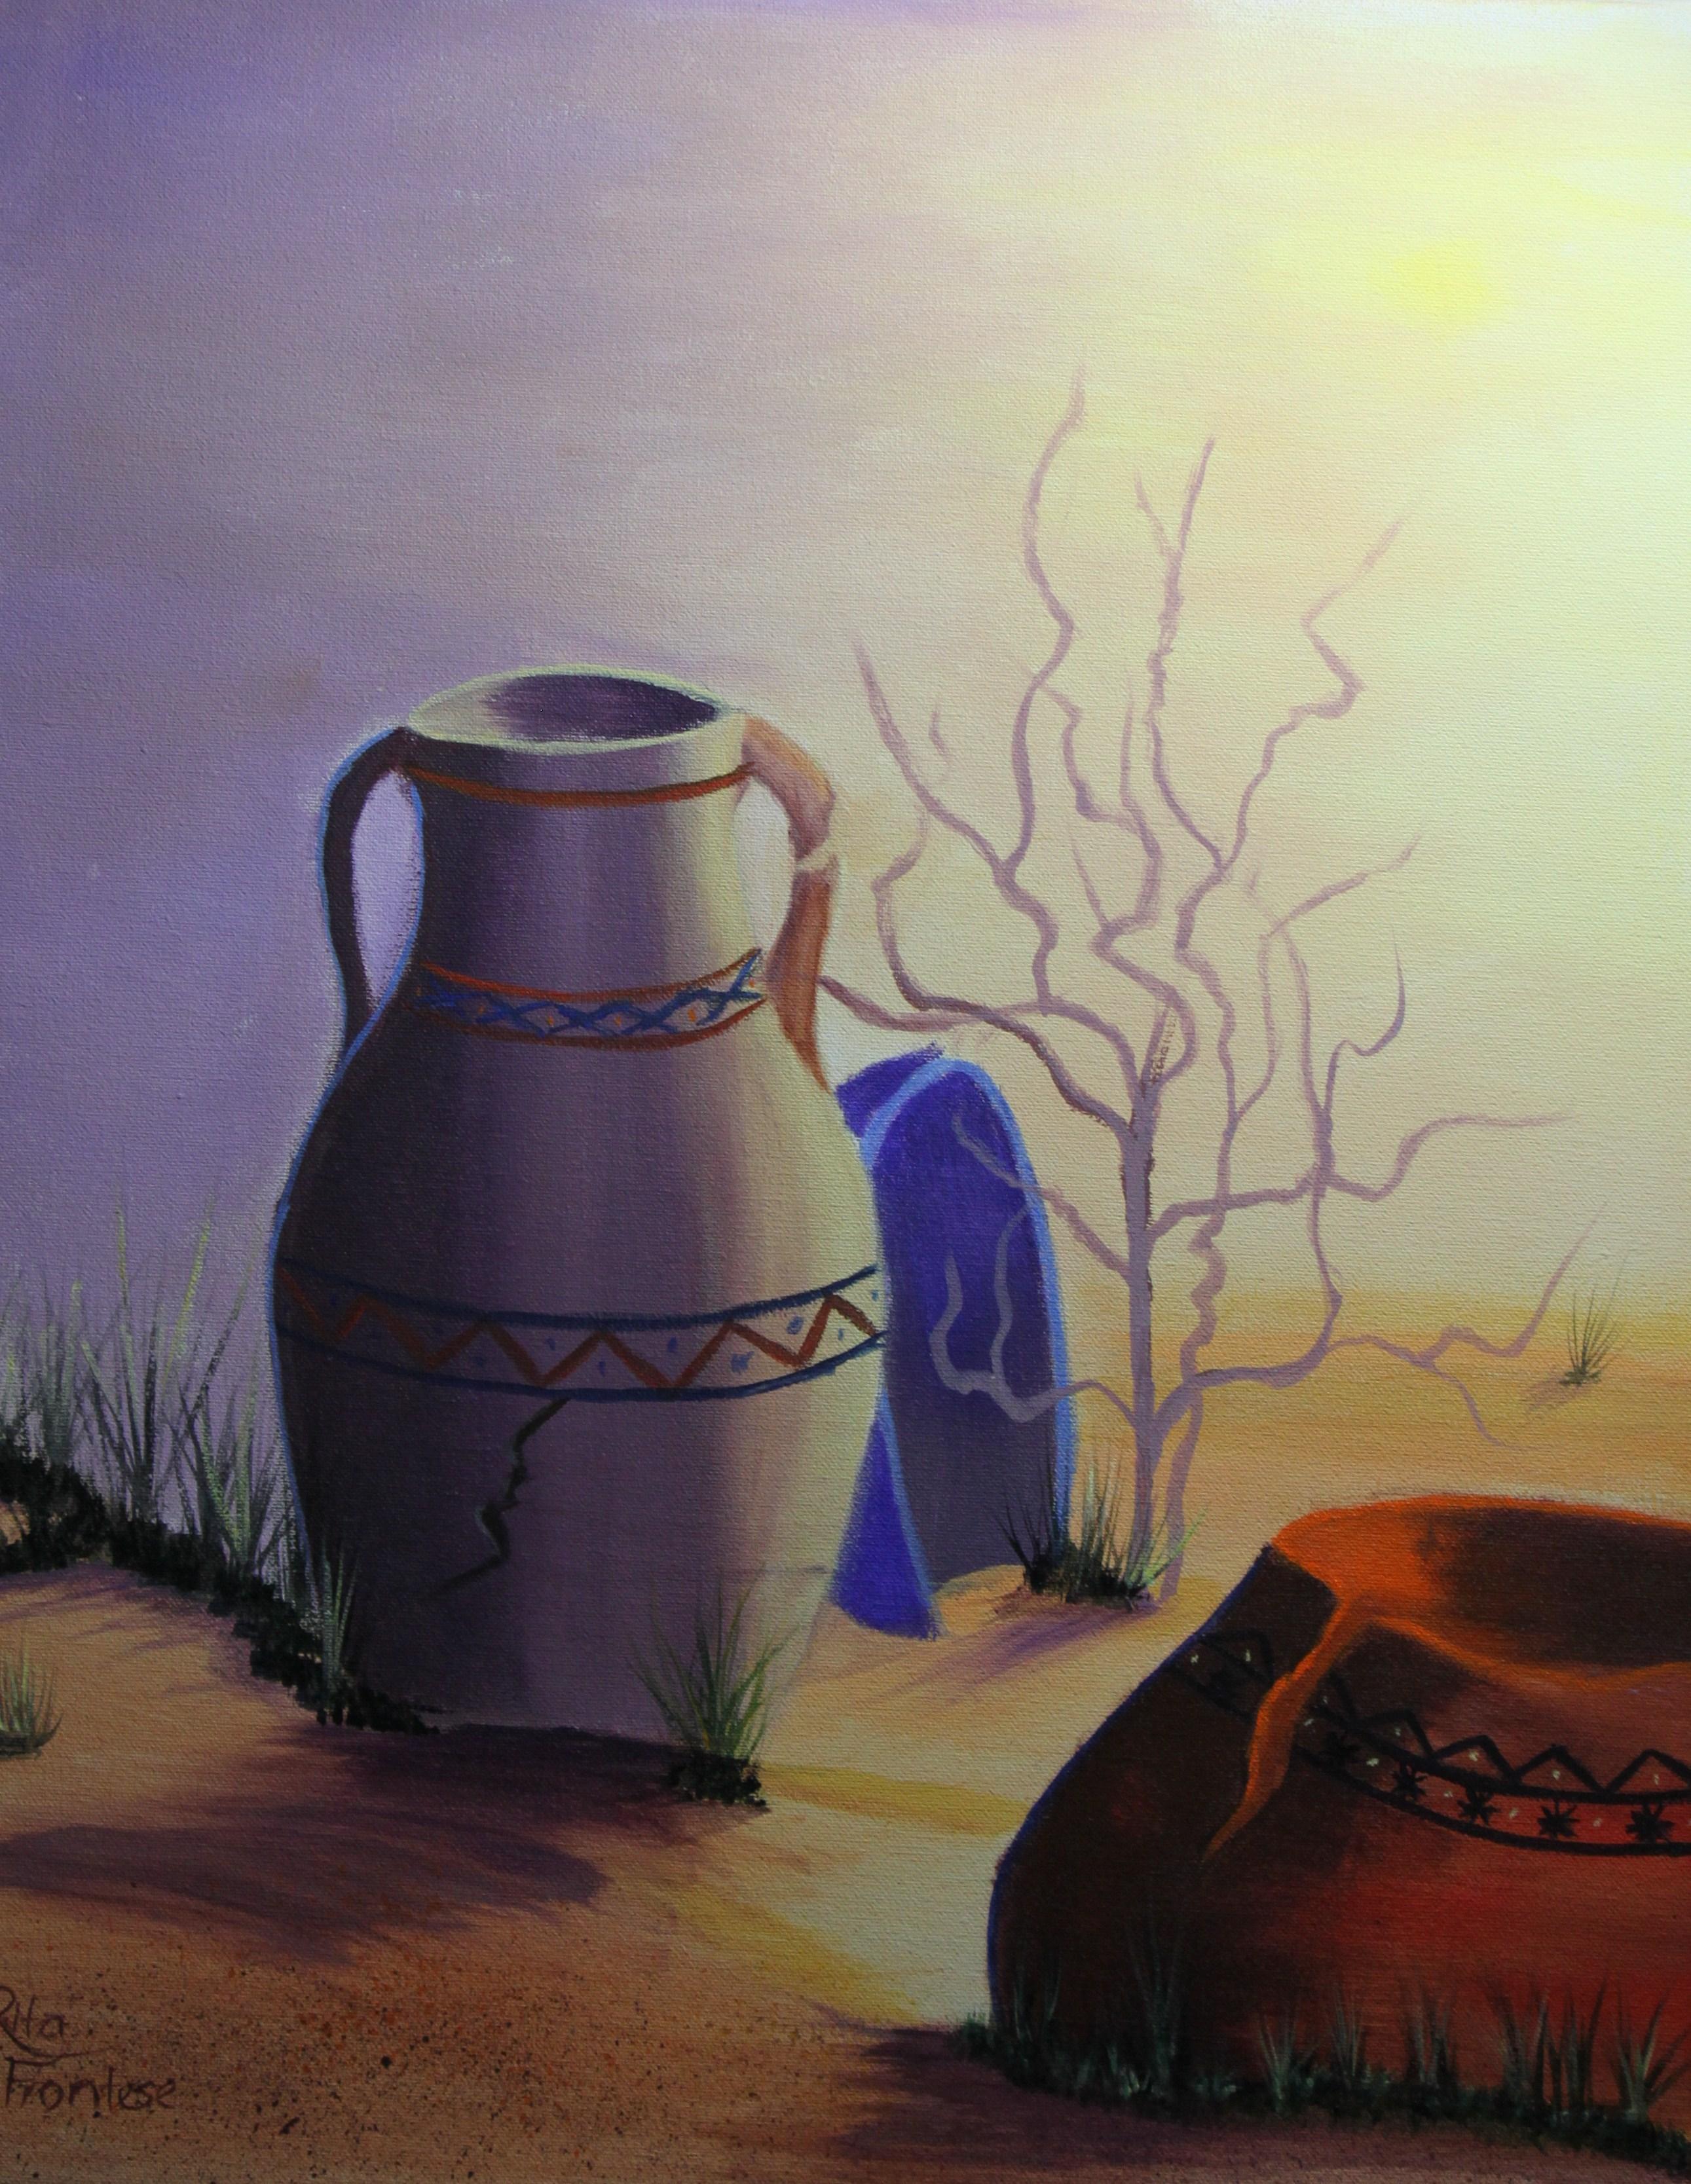 Native American Pots (16x20 in)